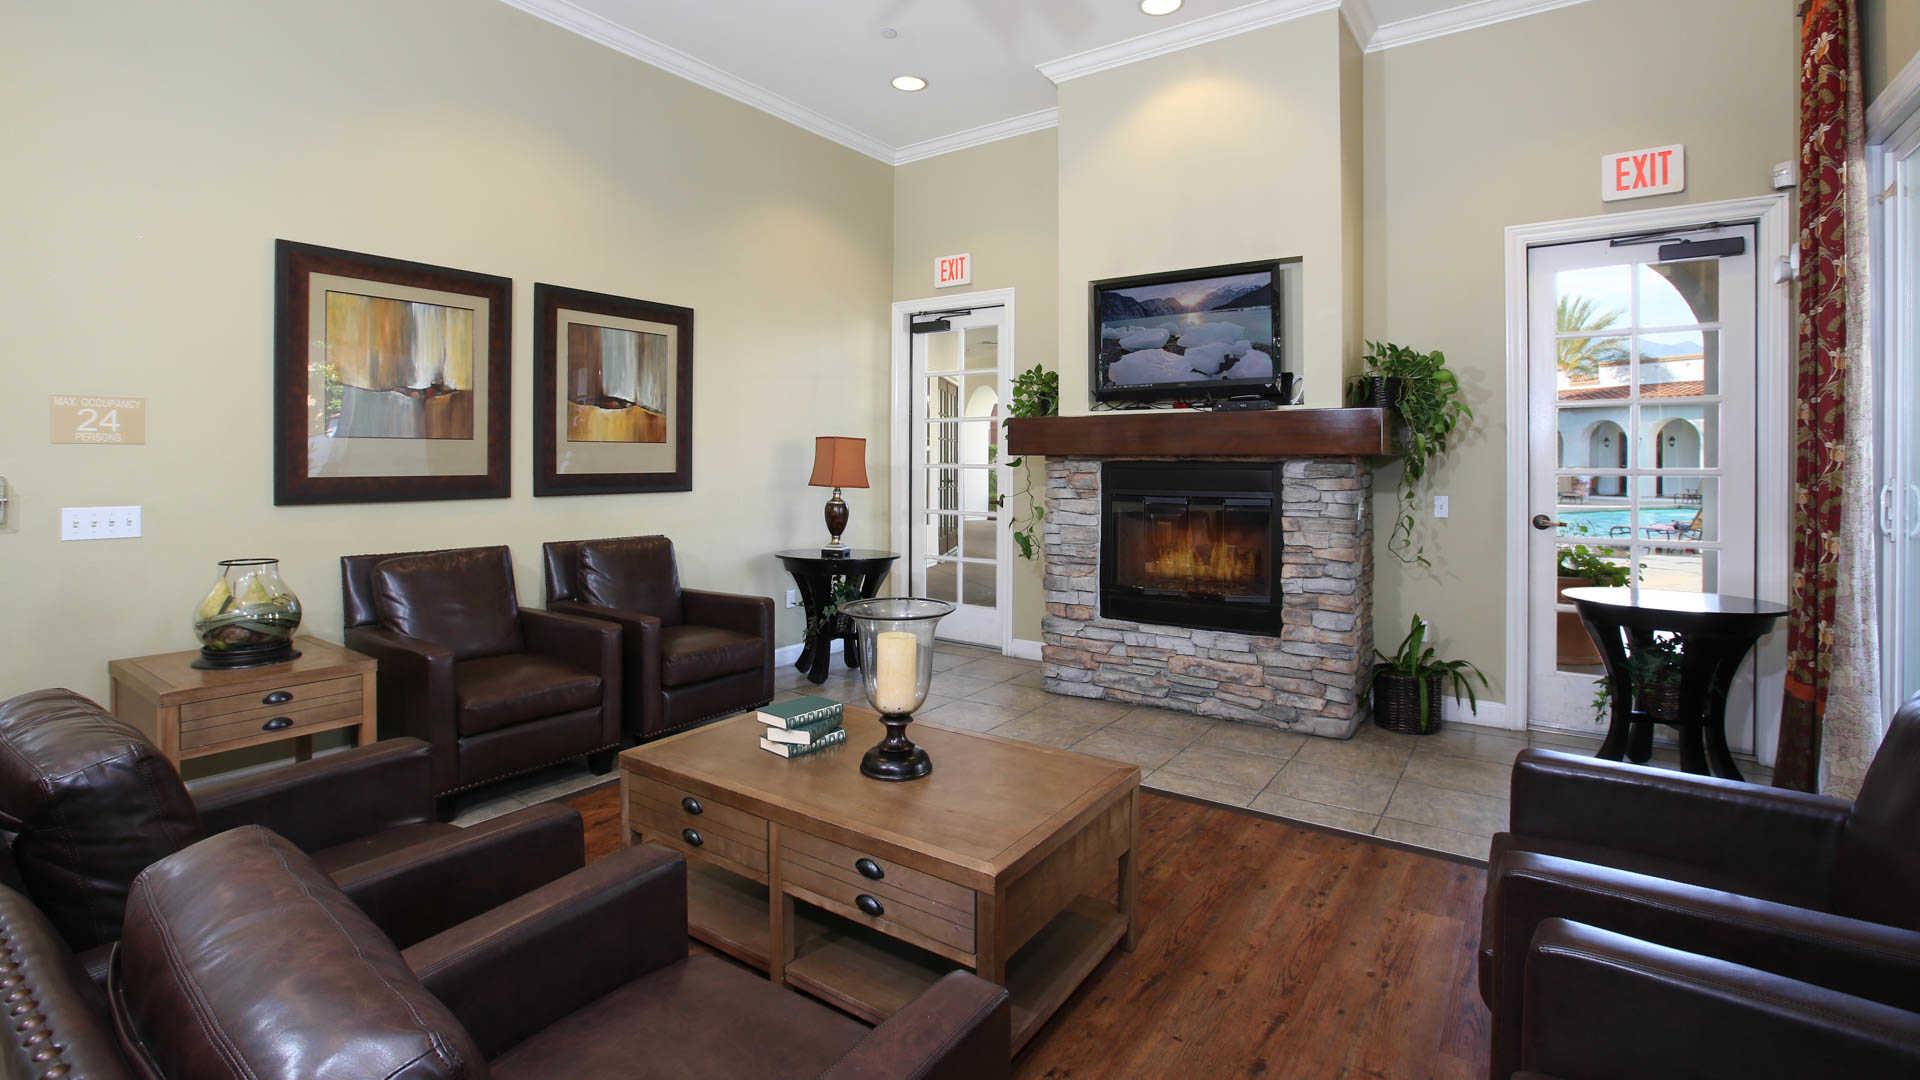 Vintage Apartments Reviews In Ontario   955 N Duesenberg Drive |  EquityApartments.com